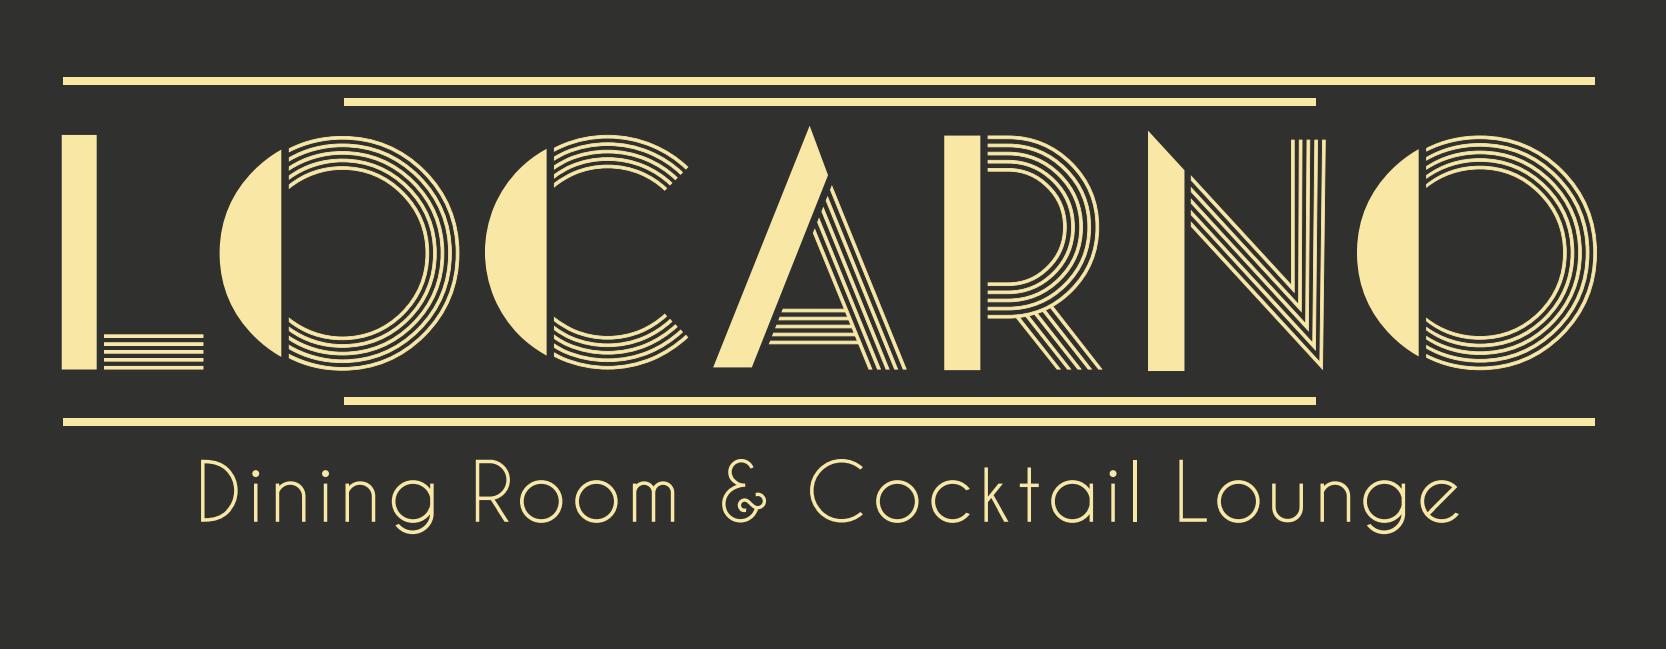 Locarno Dining Room  logo